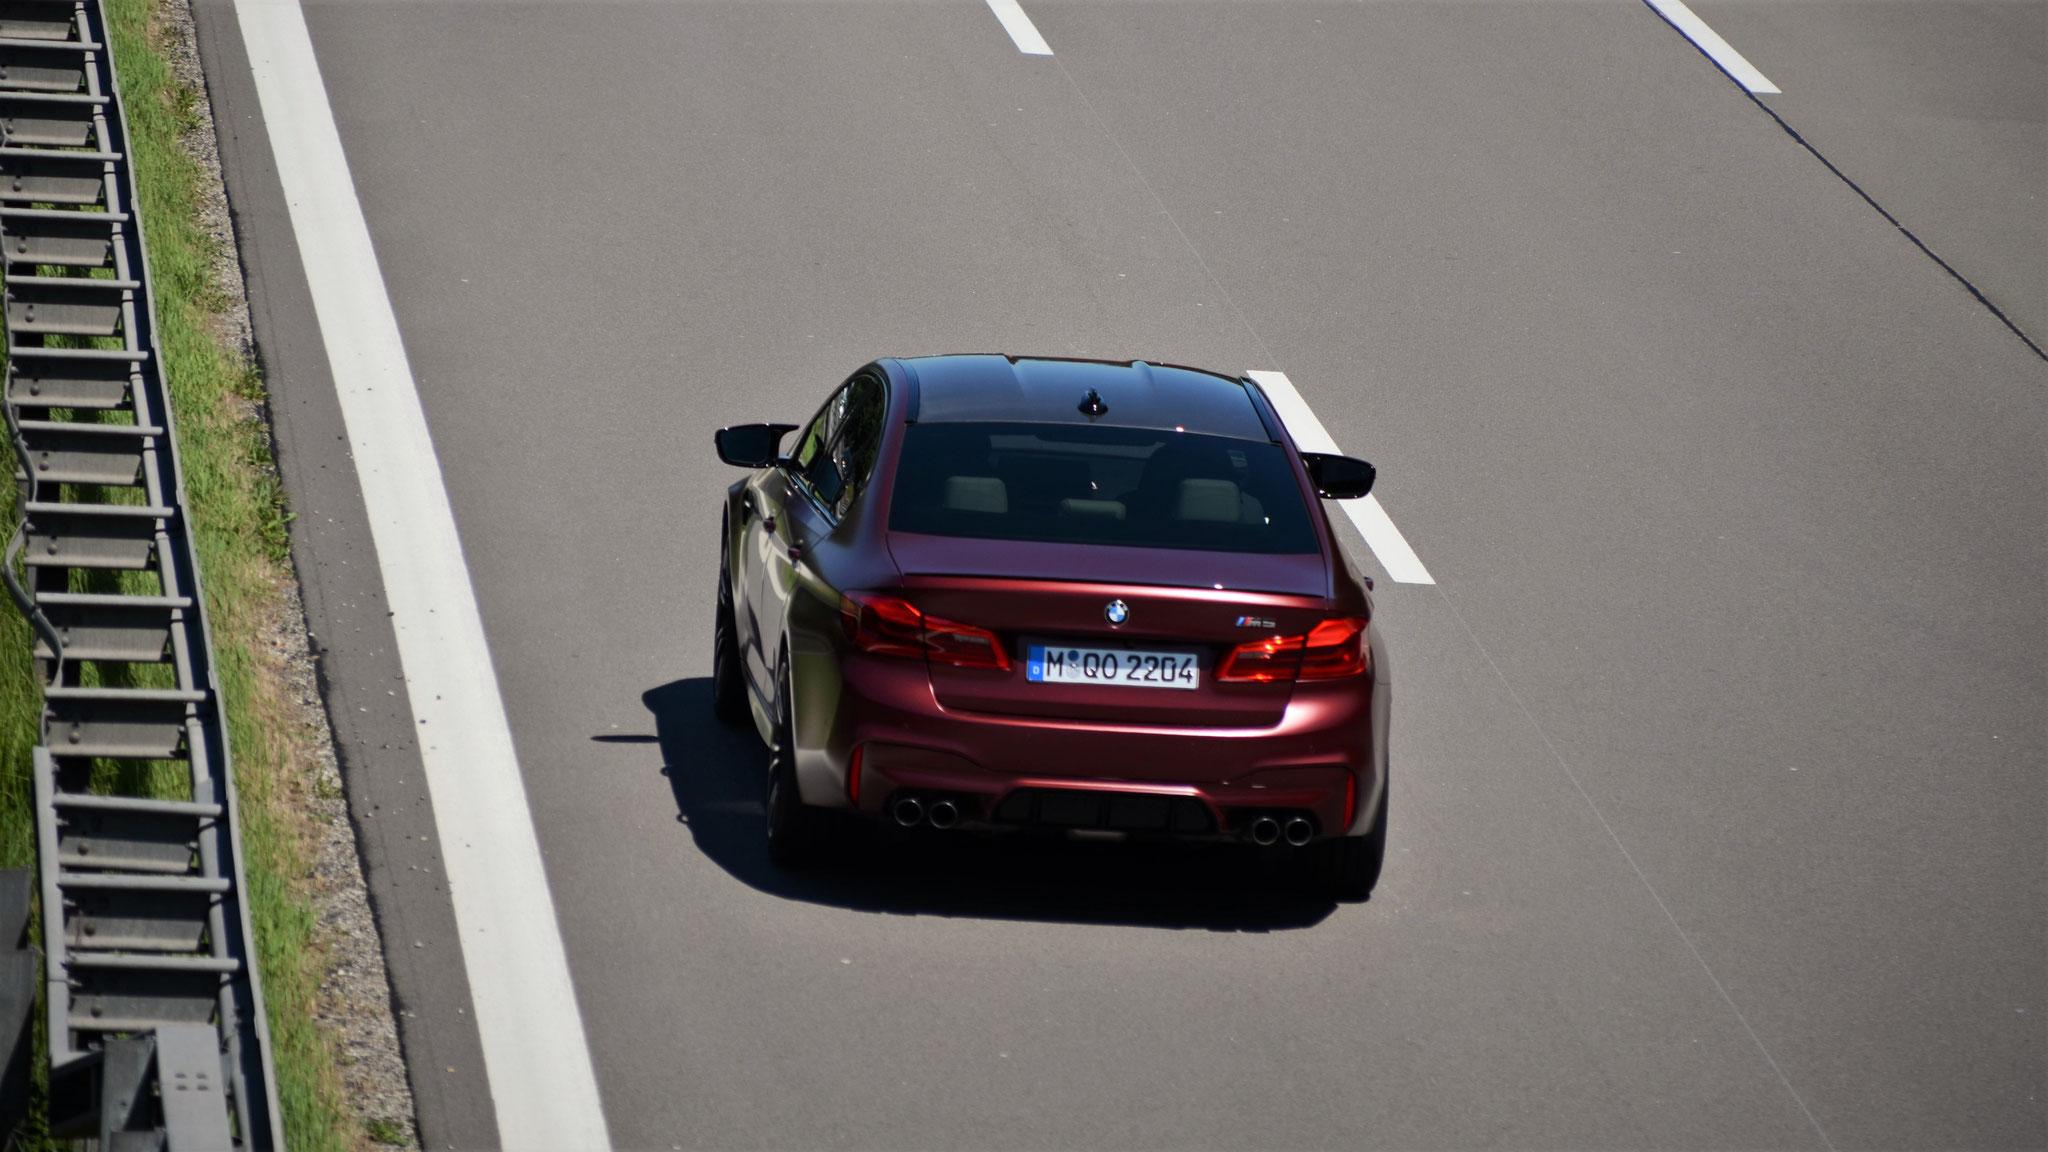 BMW M5 First Edition (1 of 400) - M-QO-2204